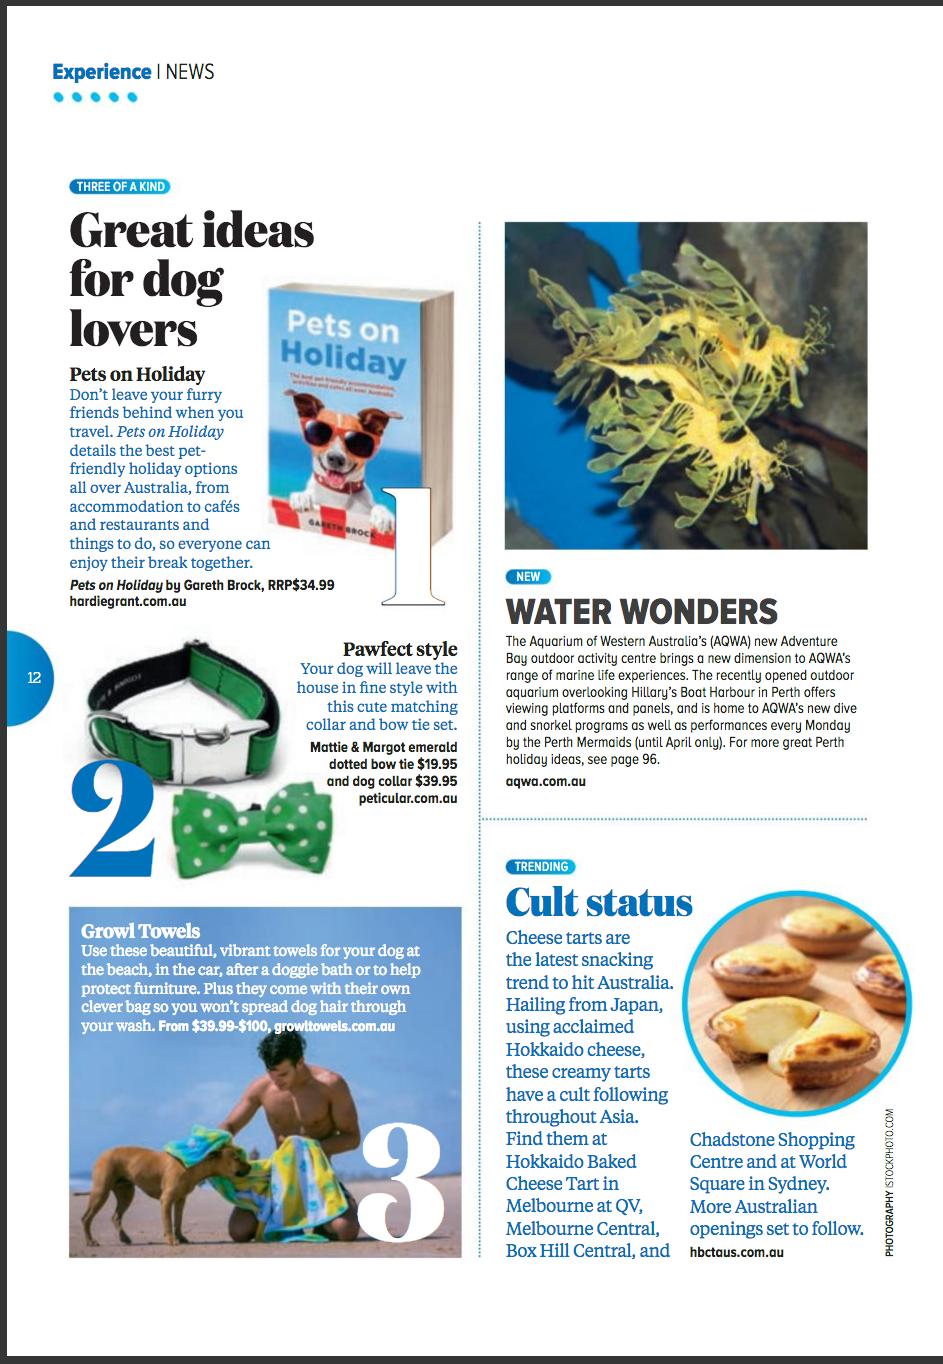 Jetstar, February 2017 Magazine